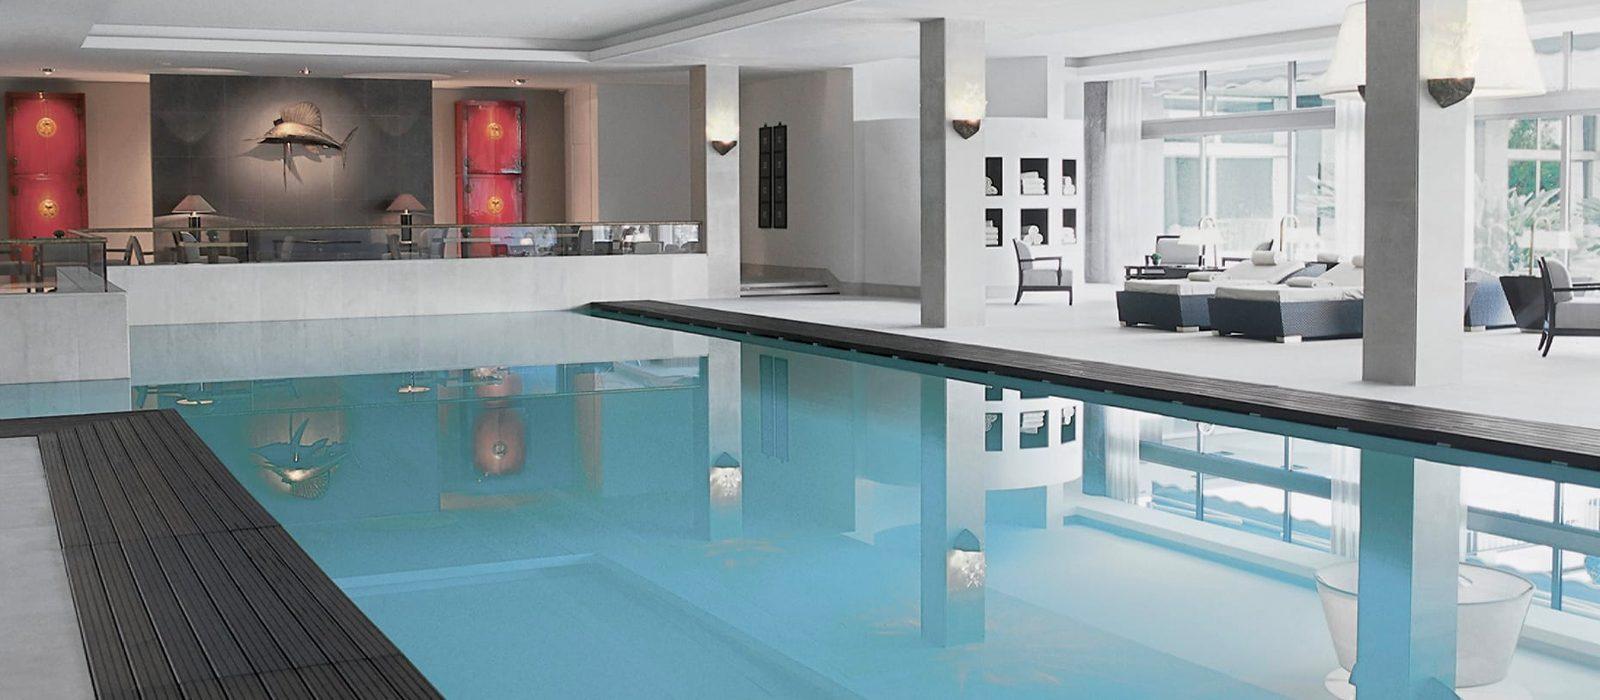 Luxury Portugal Holidays Four Seasons Hotel Ritz Lisbon Header